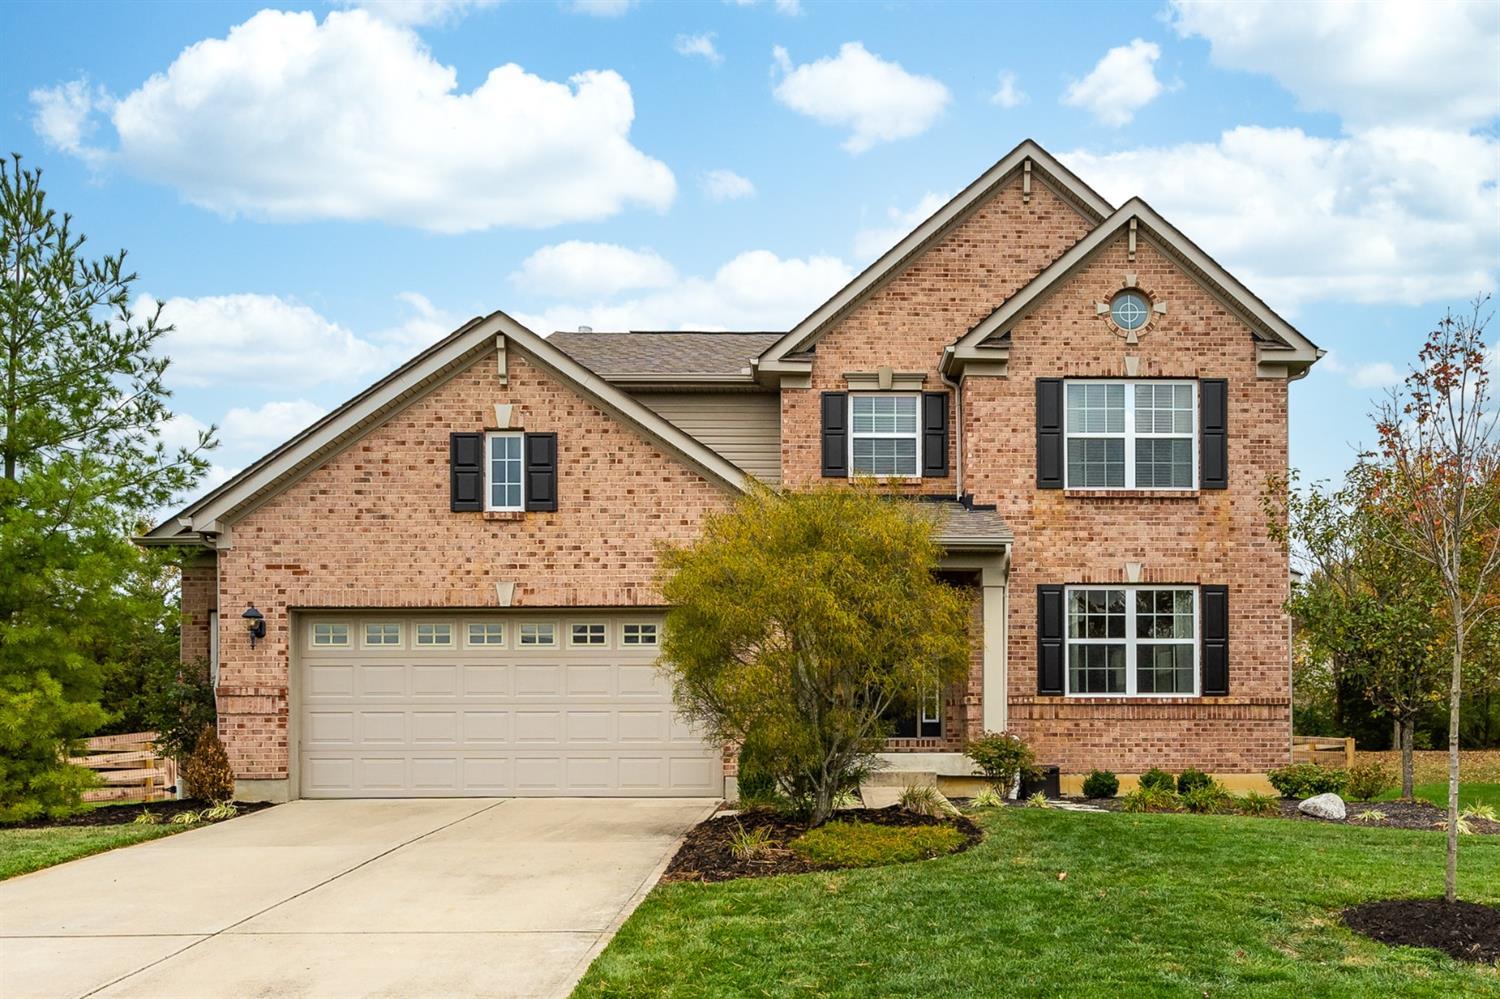 Property for sale at 4285 Fox Ridge Drive, Batavia Twp,  Ohio 45103